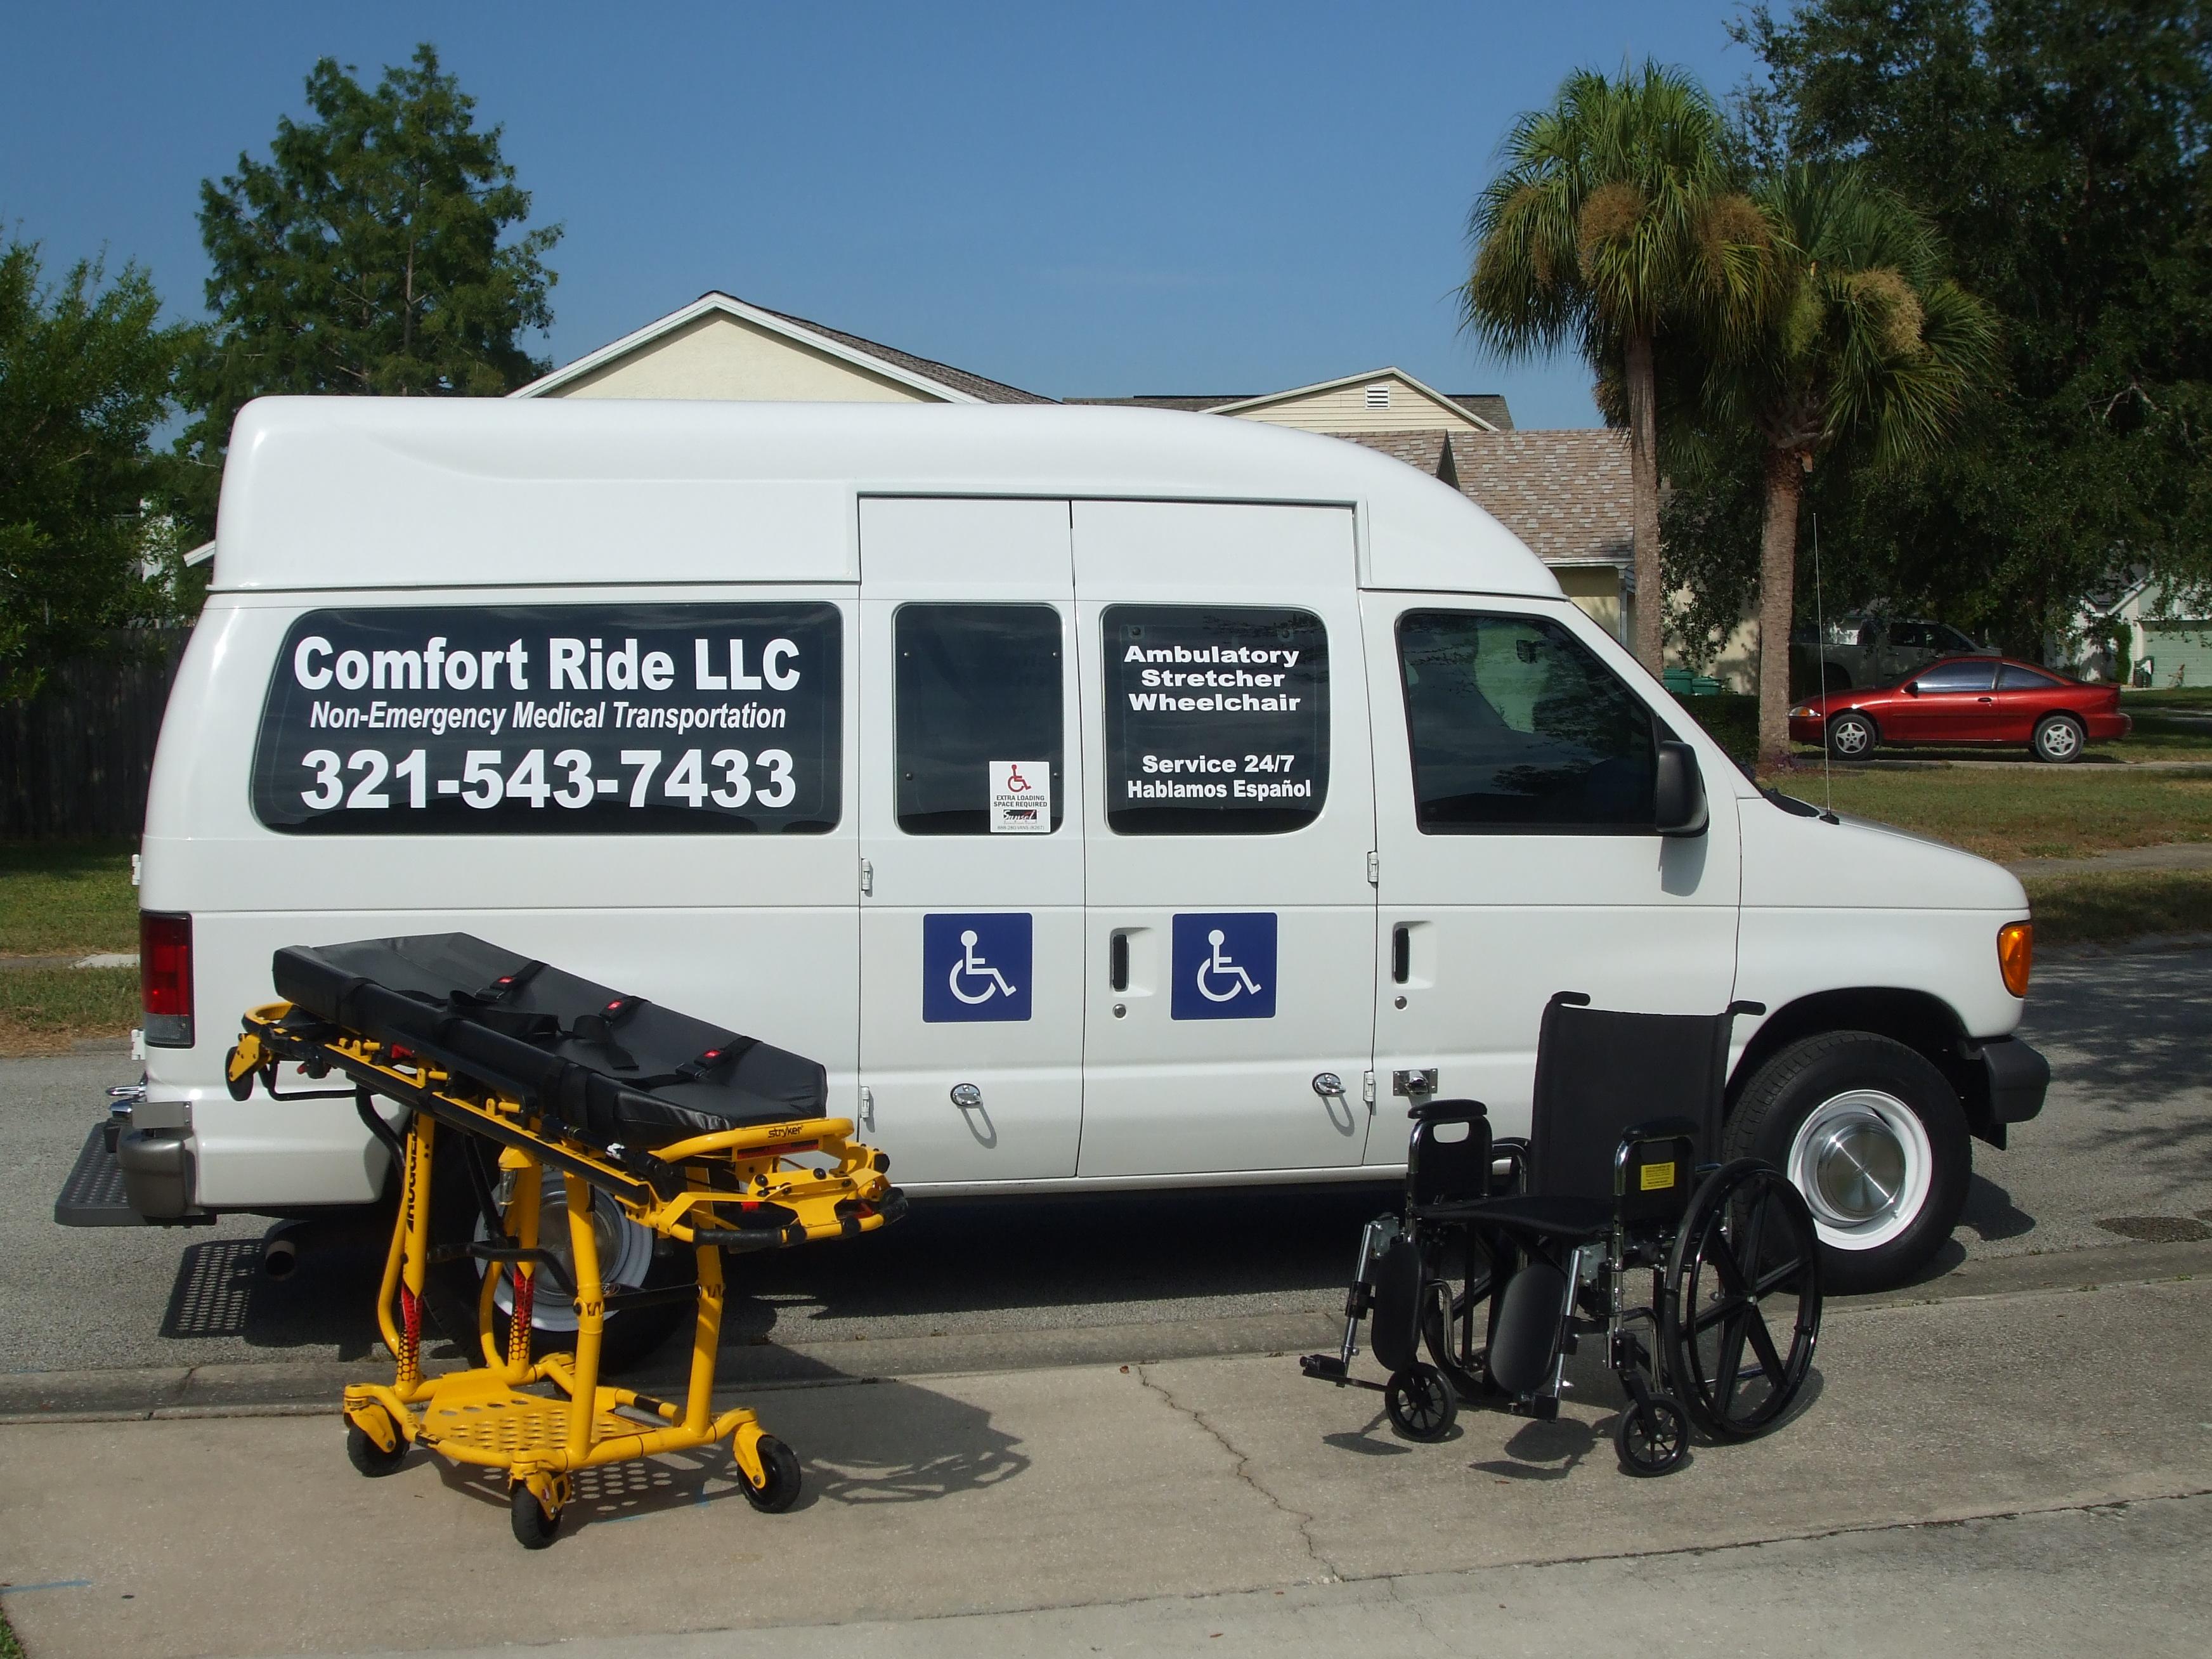 Comfort Ride LLC image 28